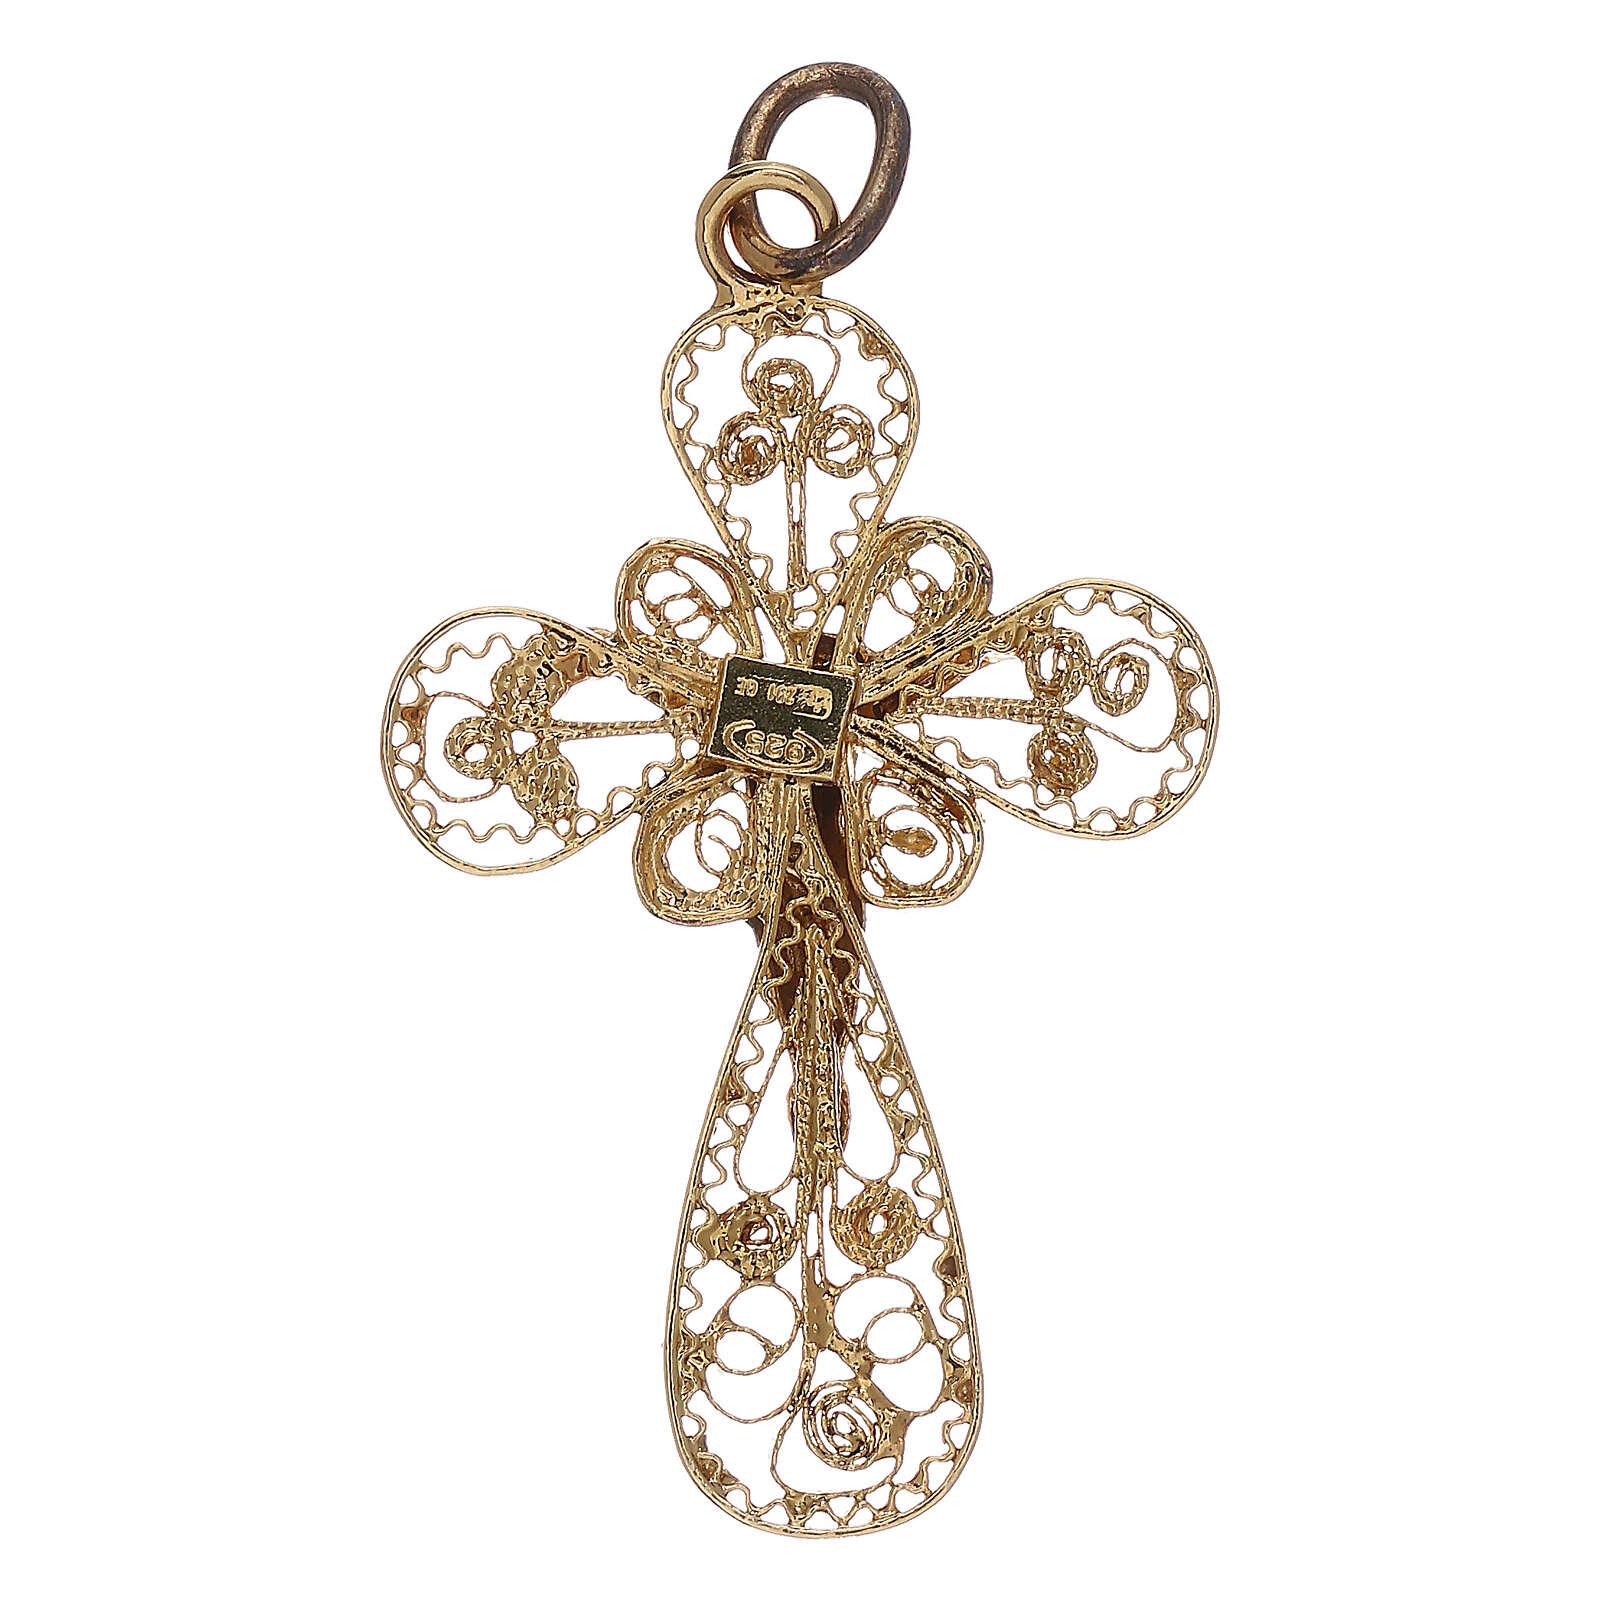 Croce 3 cm filigrana in argento 925 dorato 4